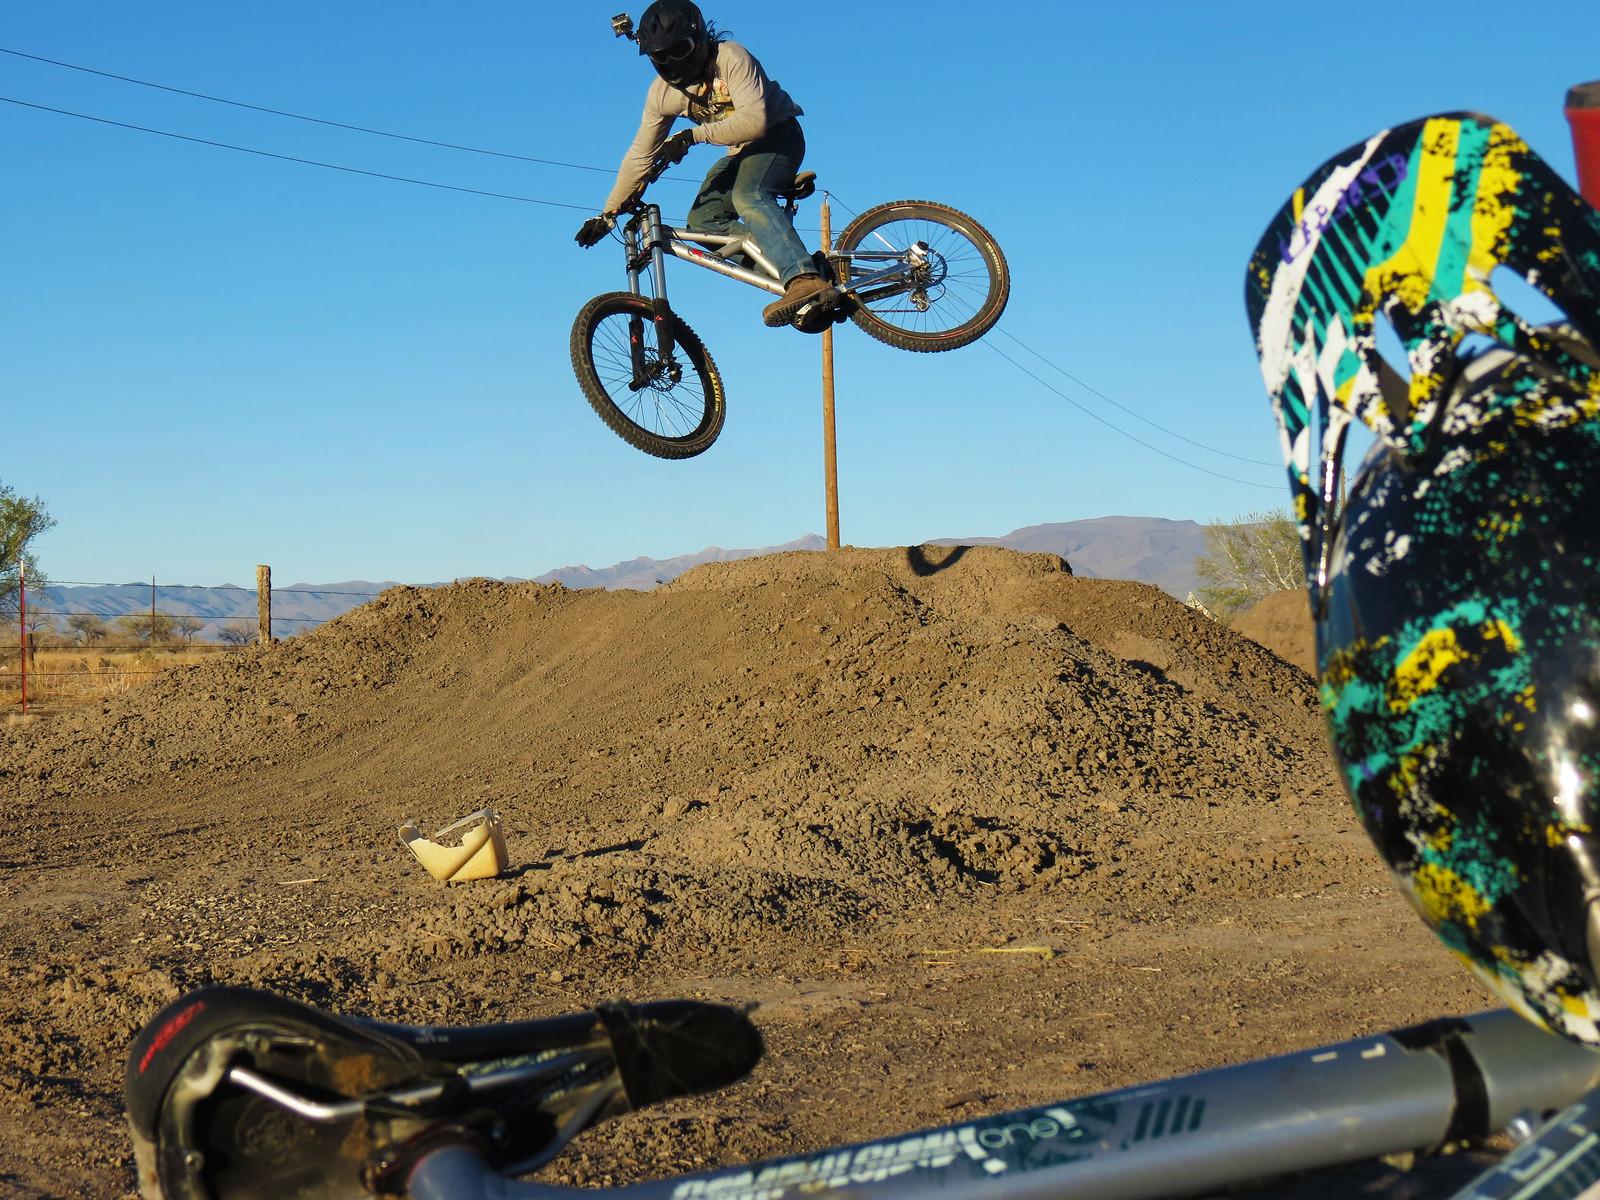 cim whipz 3 - Moosey - Mountain Biking Pictures - Vital MTB